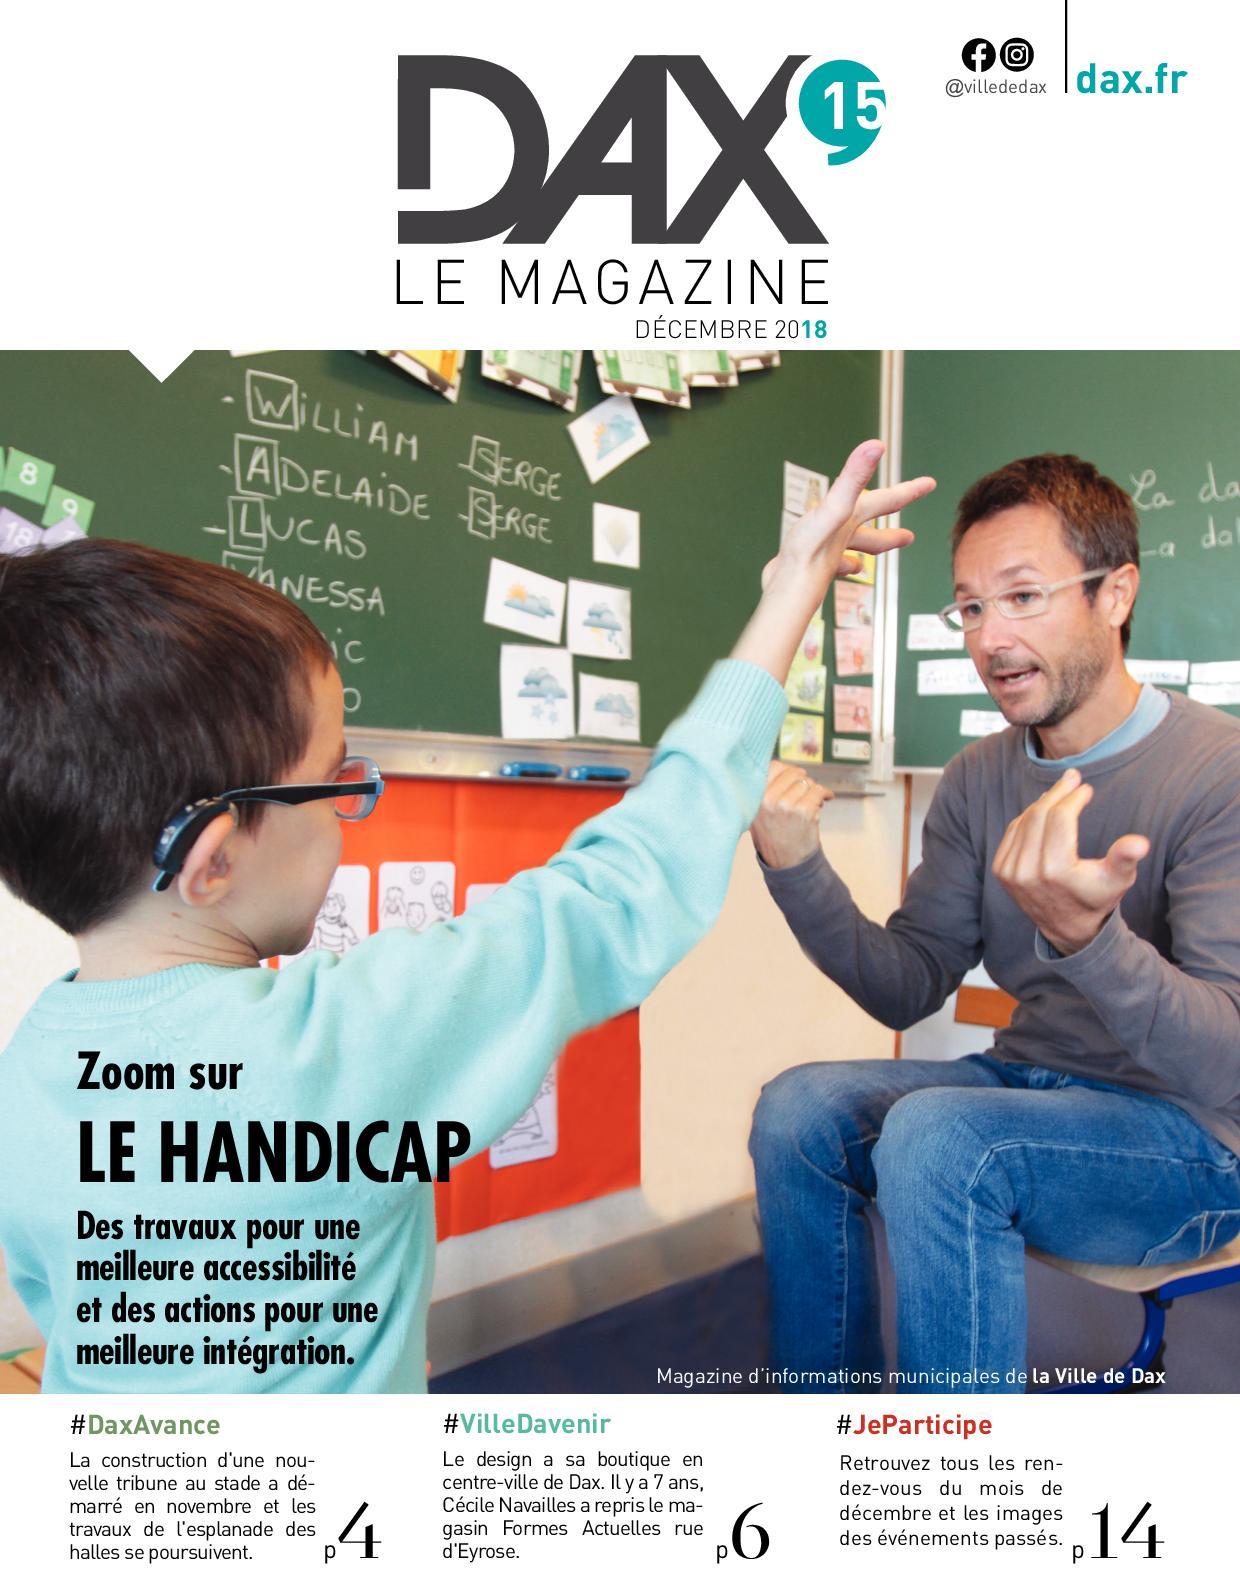 e6aca8767304 Calaméo - Dax, le magazine décembre 2018